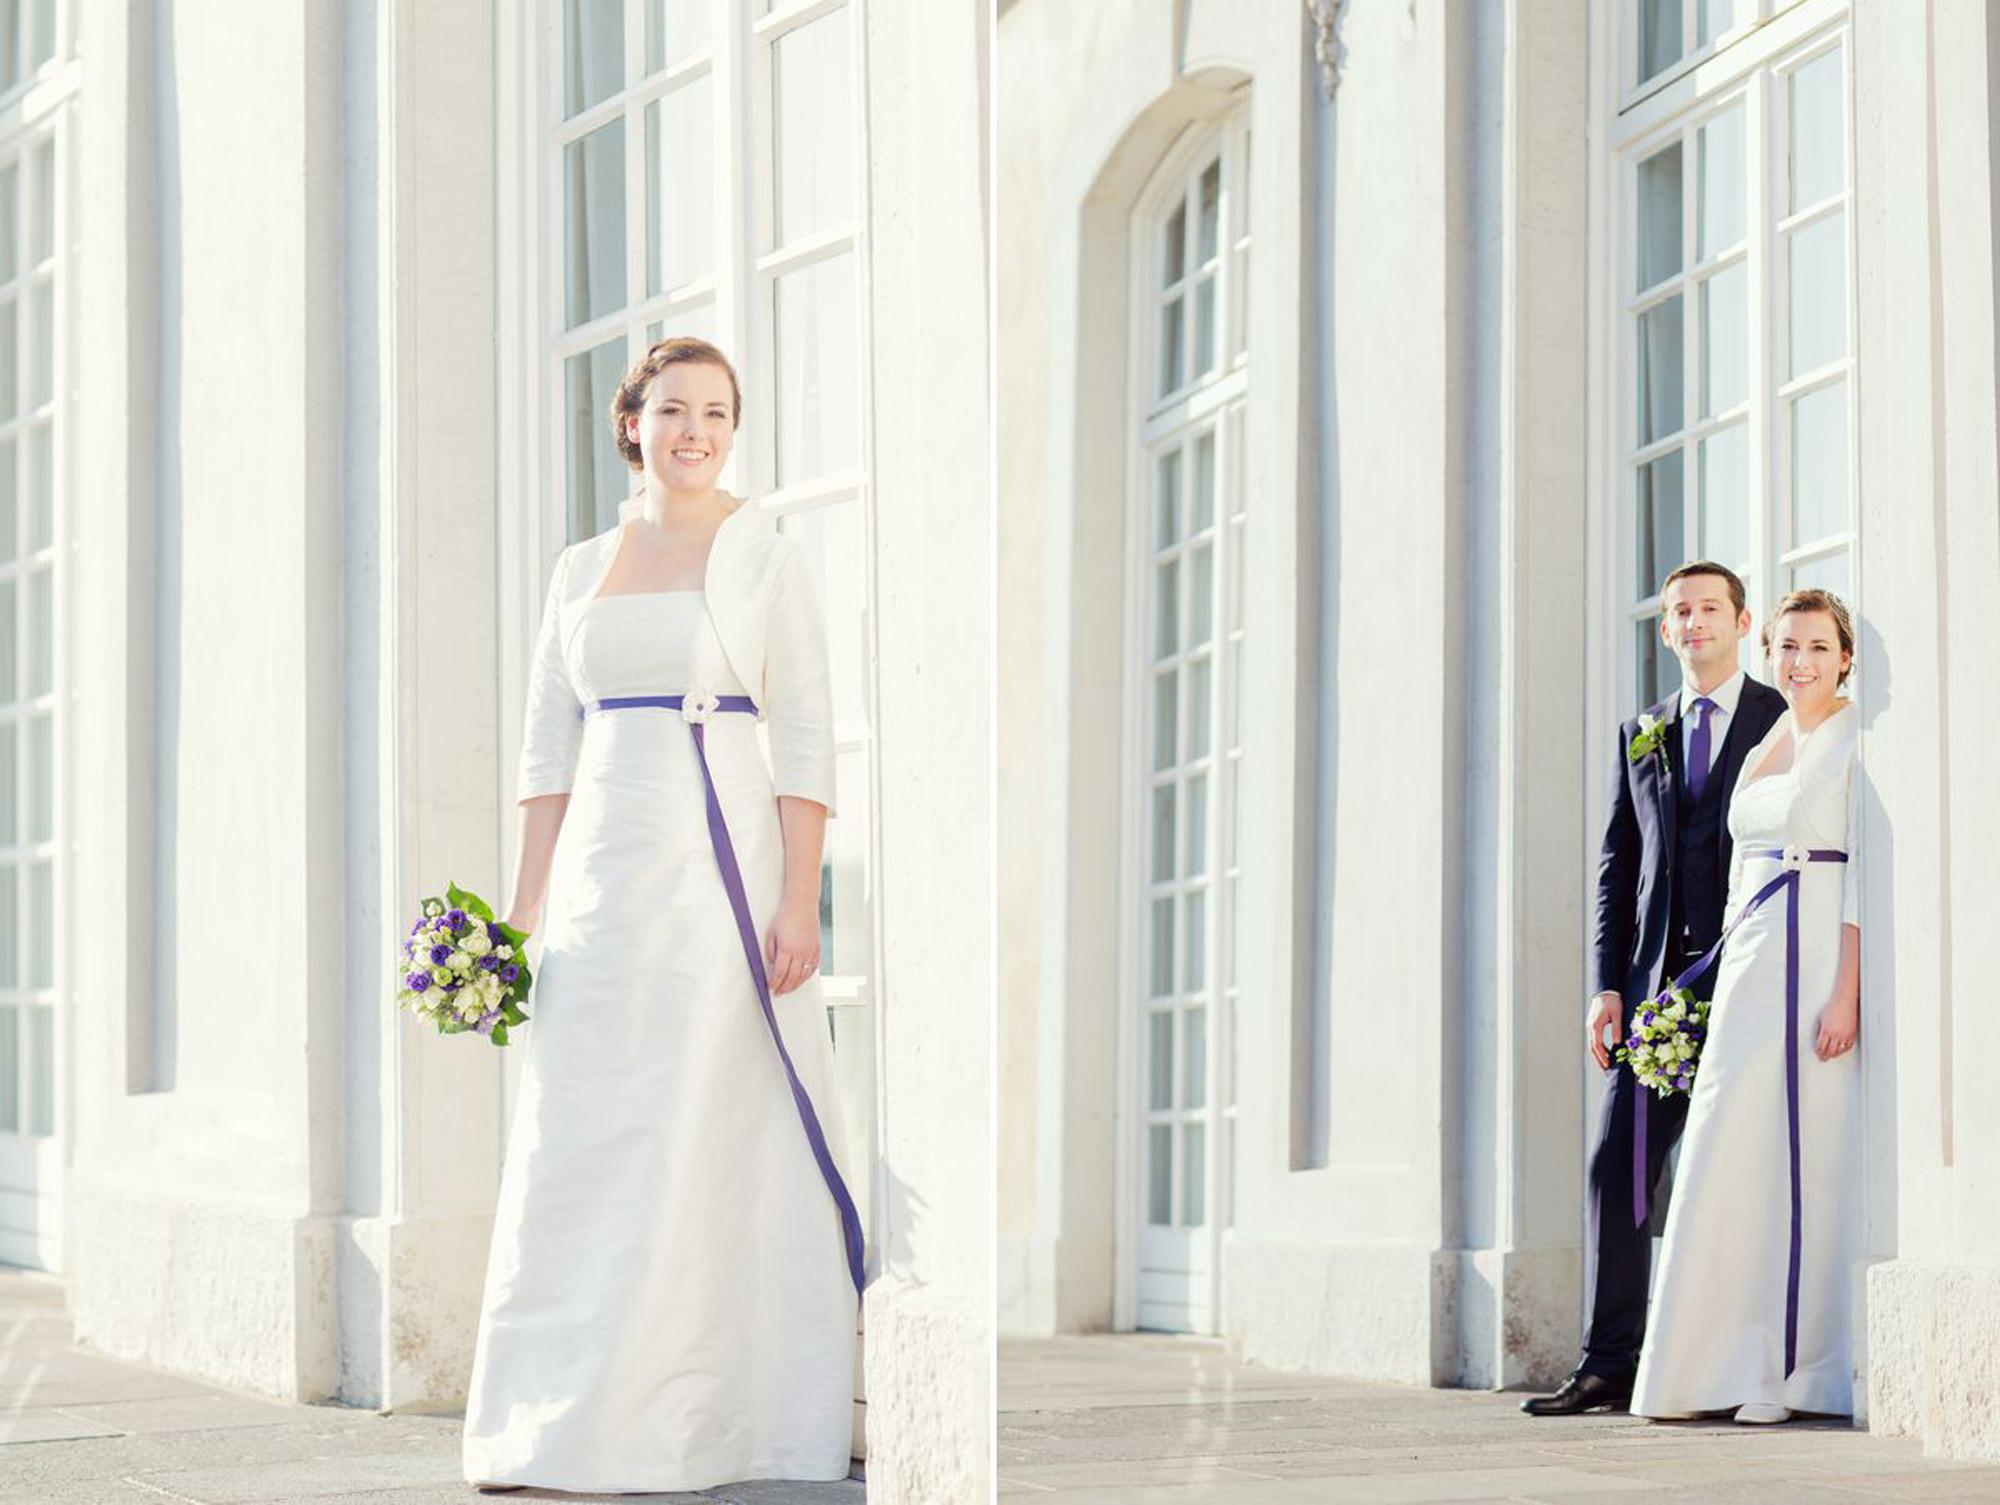 Hochzeit-Schloss-Bruehl_25.jpg